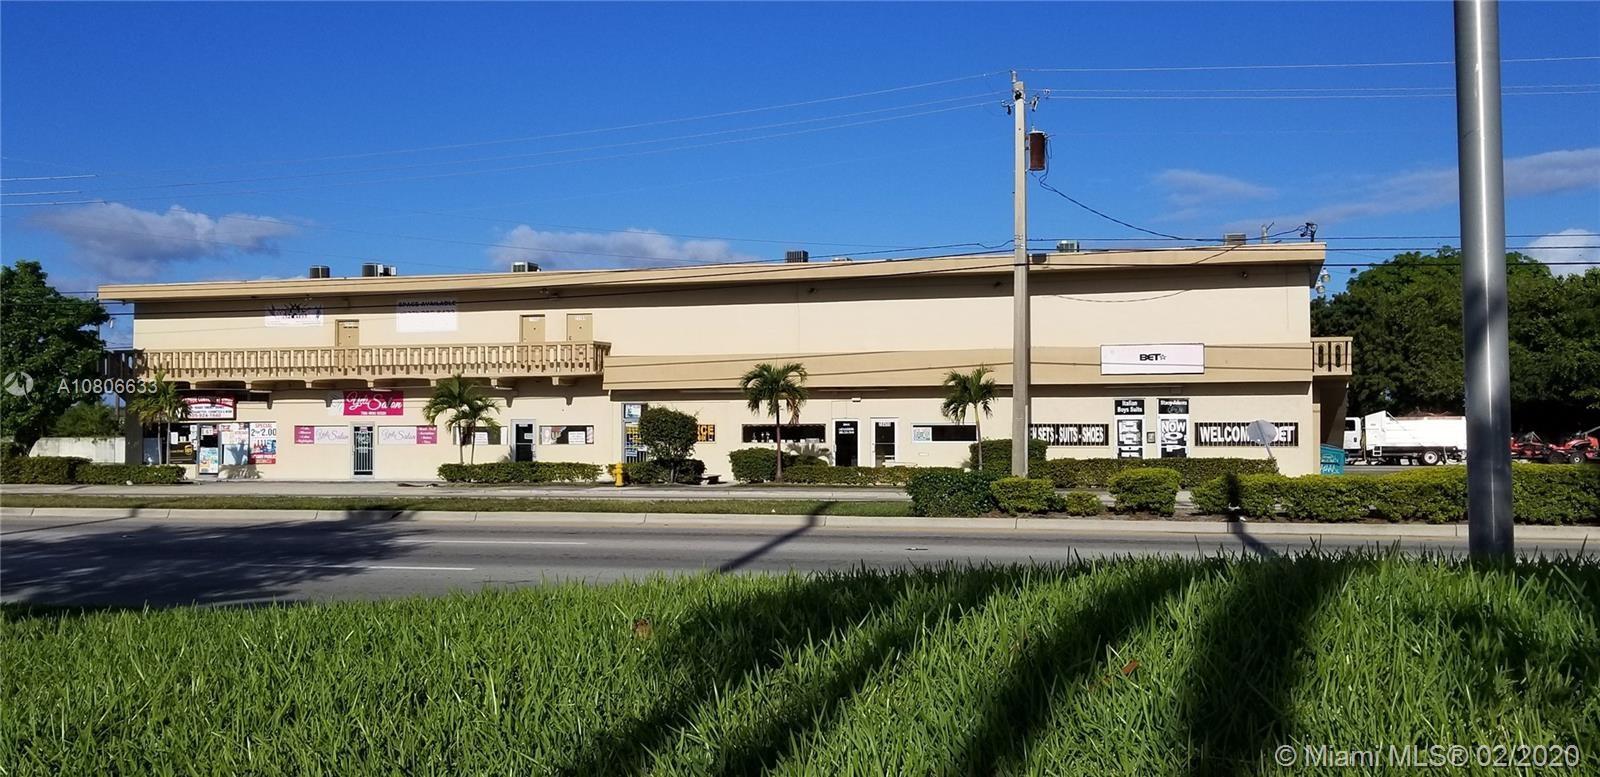 20460 S Dixie Hwy, Cutler Bay, FL 33189